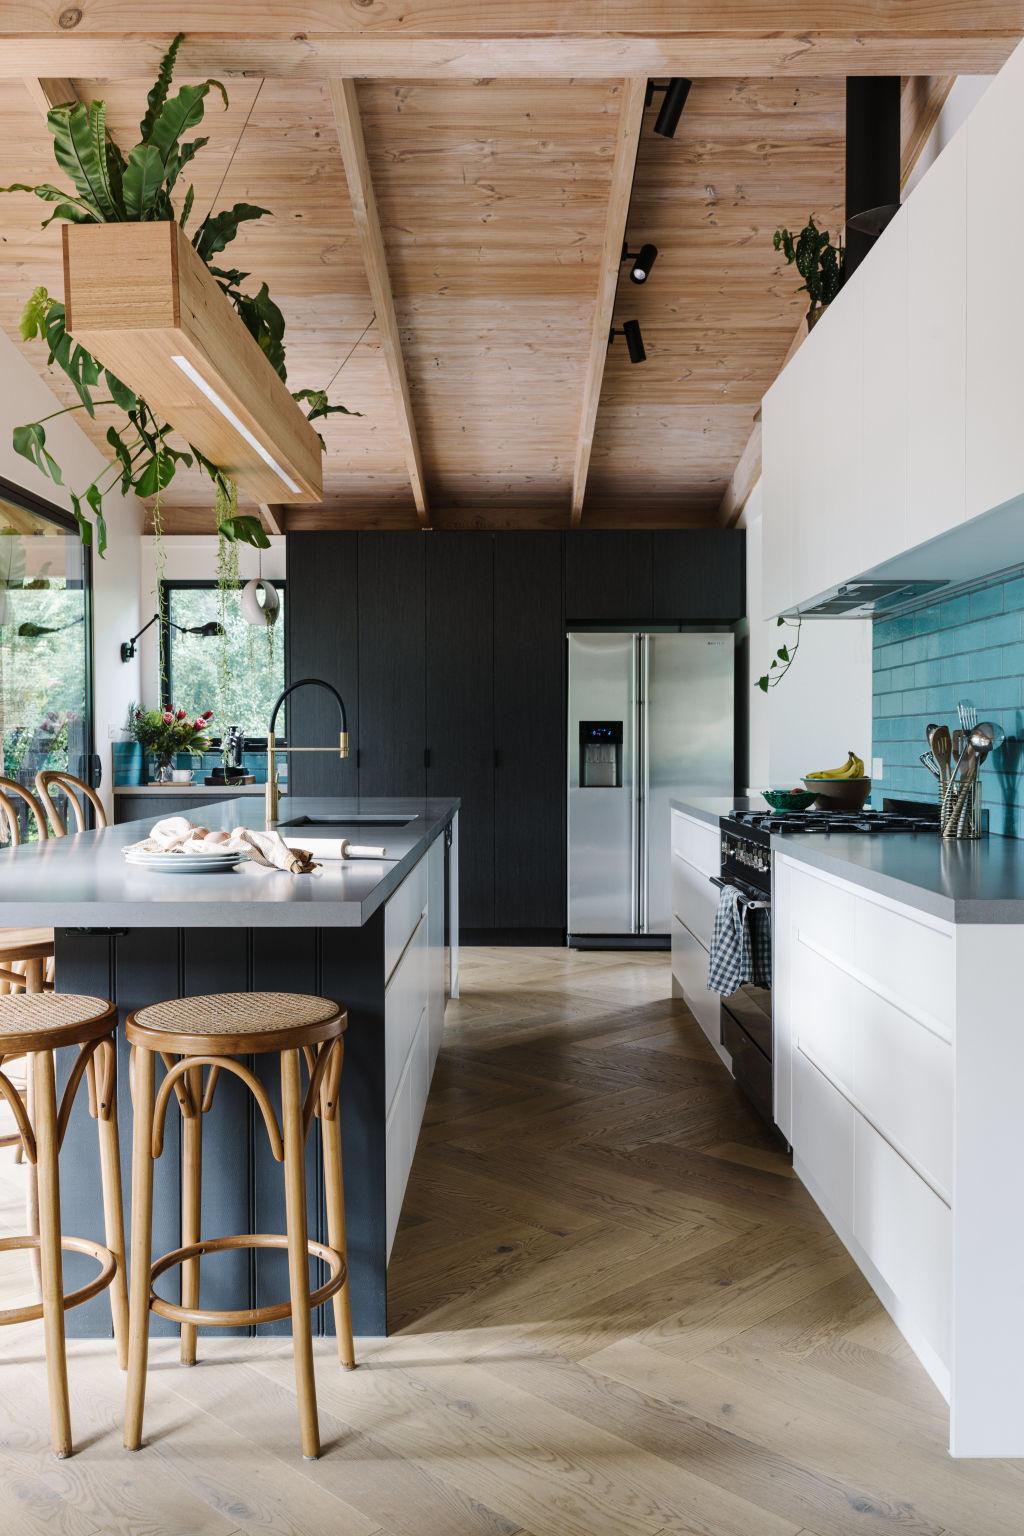 Sanctum Homes, Blair Street. Design: Kate Lucas - Open Door Design, Feature planter box: Lee Gratton - Gratton Design, Joinery: Skyline Kitchens